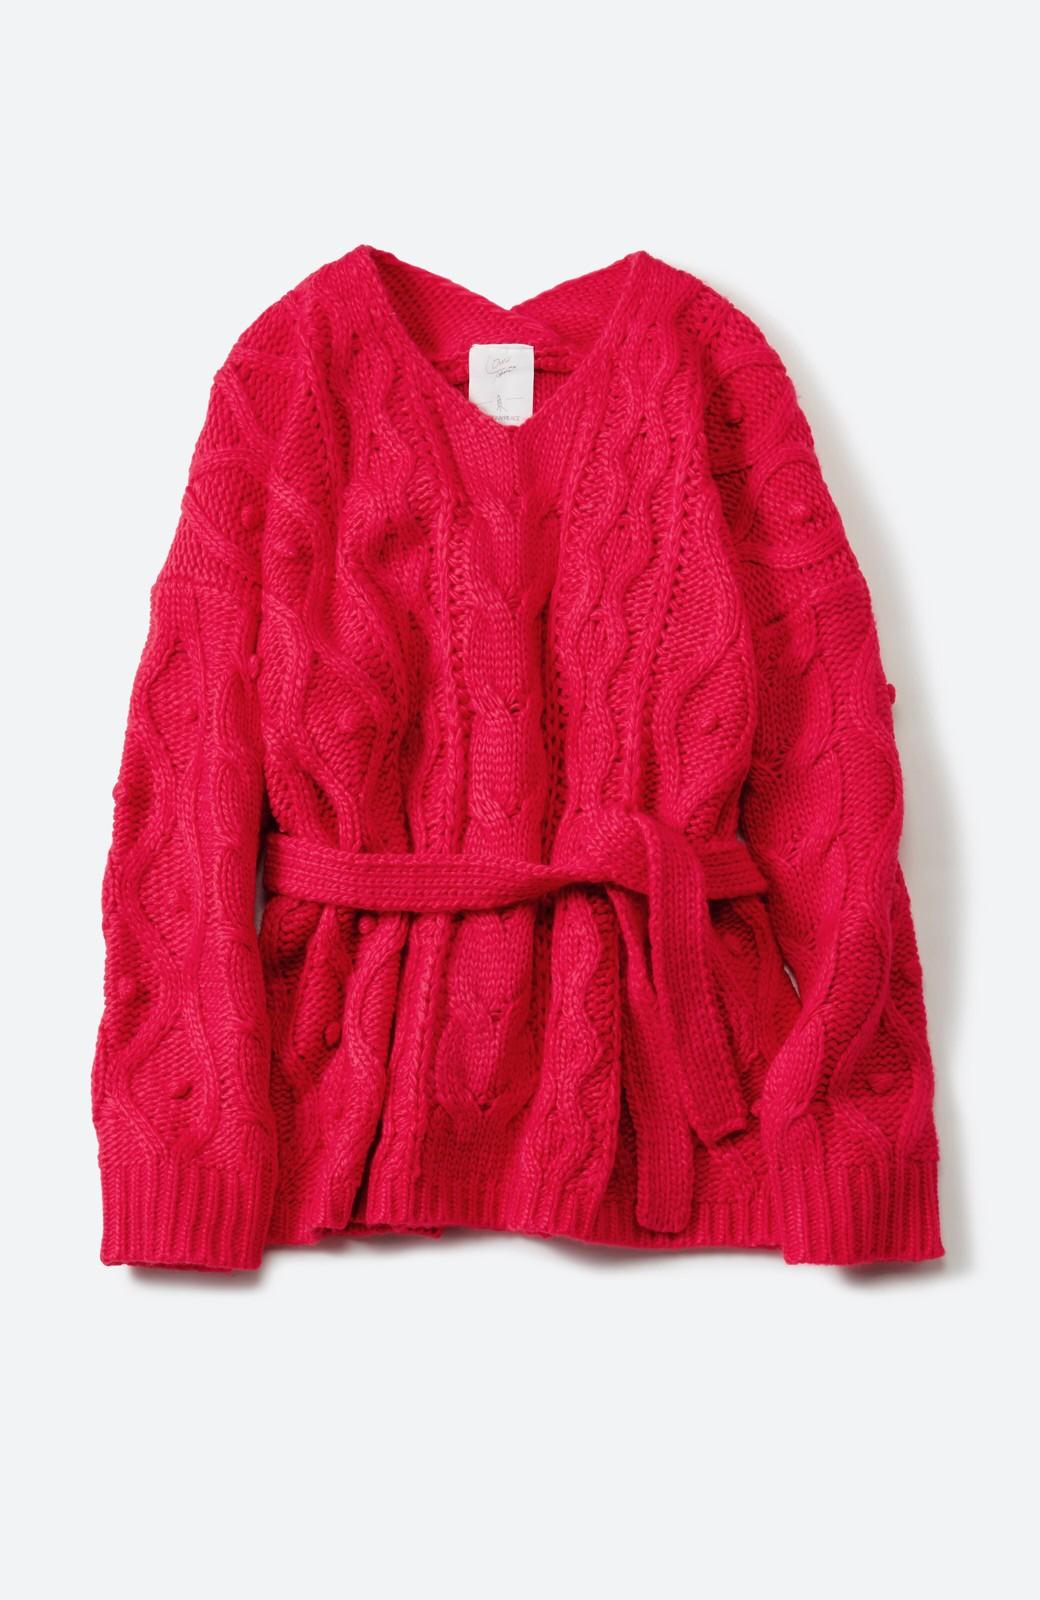 haco! <高橋愛さんコラボ>ラブ&ピースプロジェクト パプコーン編みのウエストマークケーブルニットトップス <ピンク>の商品写真2